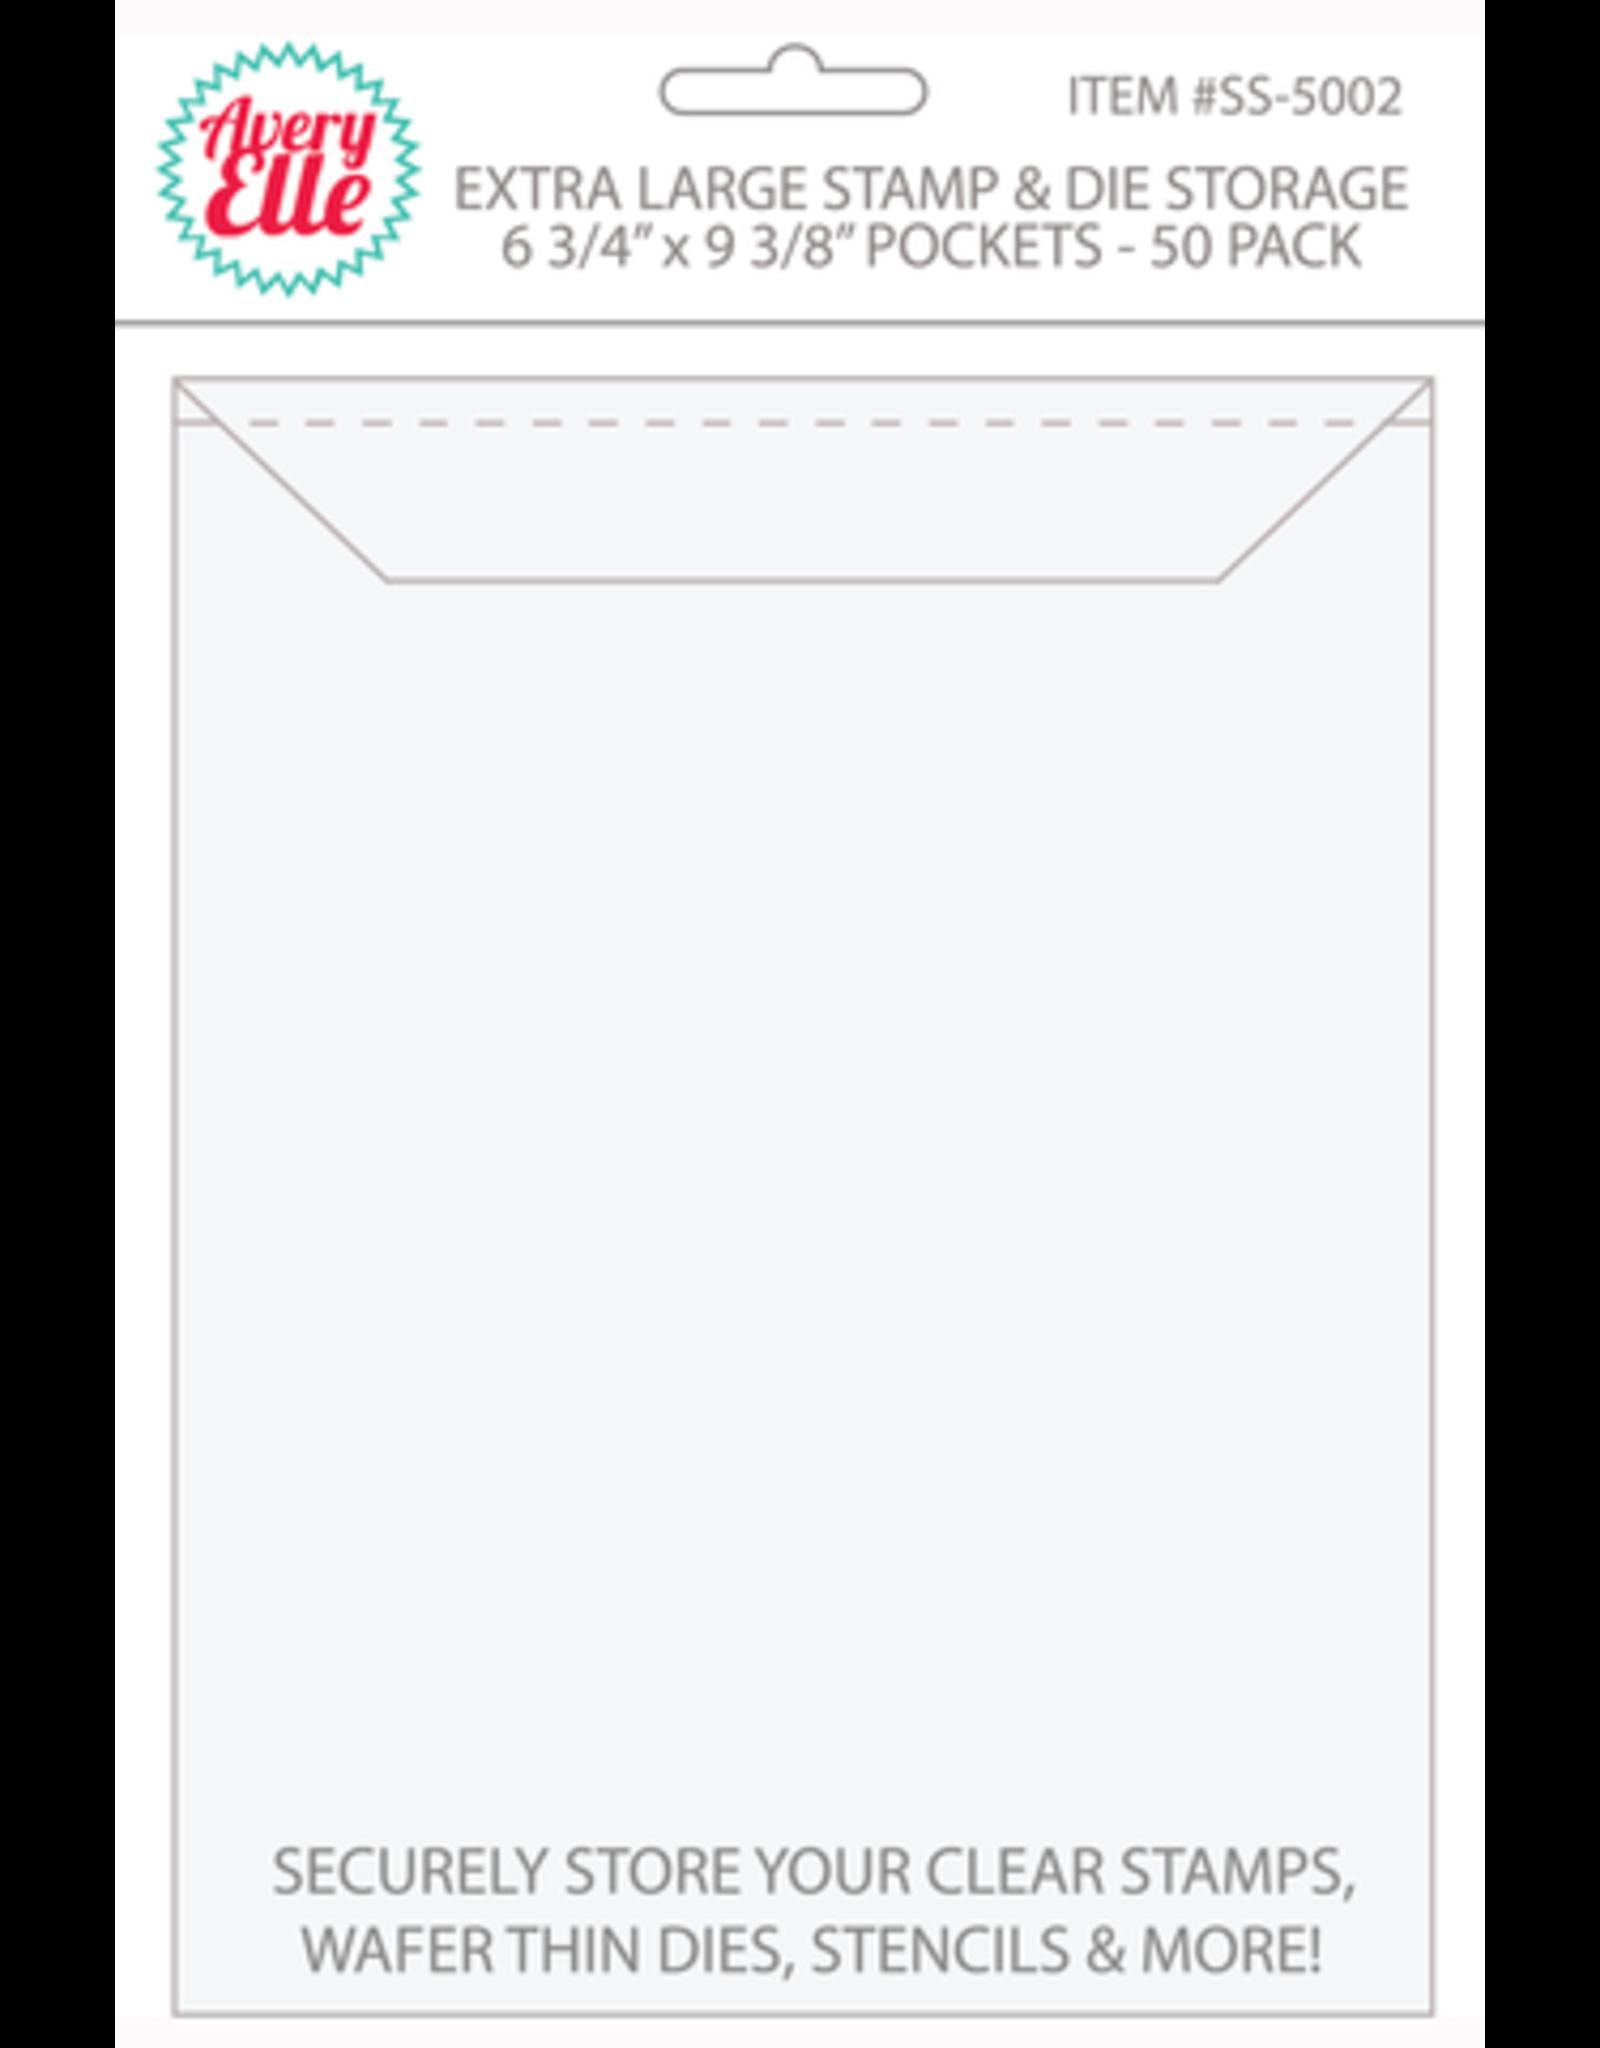 Avery Elle Stamp & Die Storage Pockets Extra Large